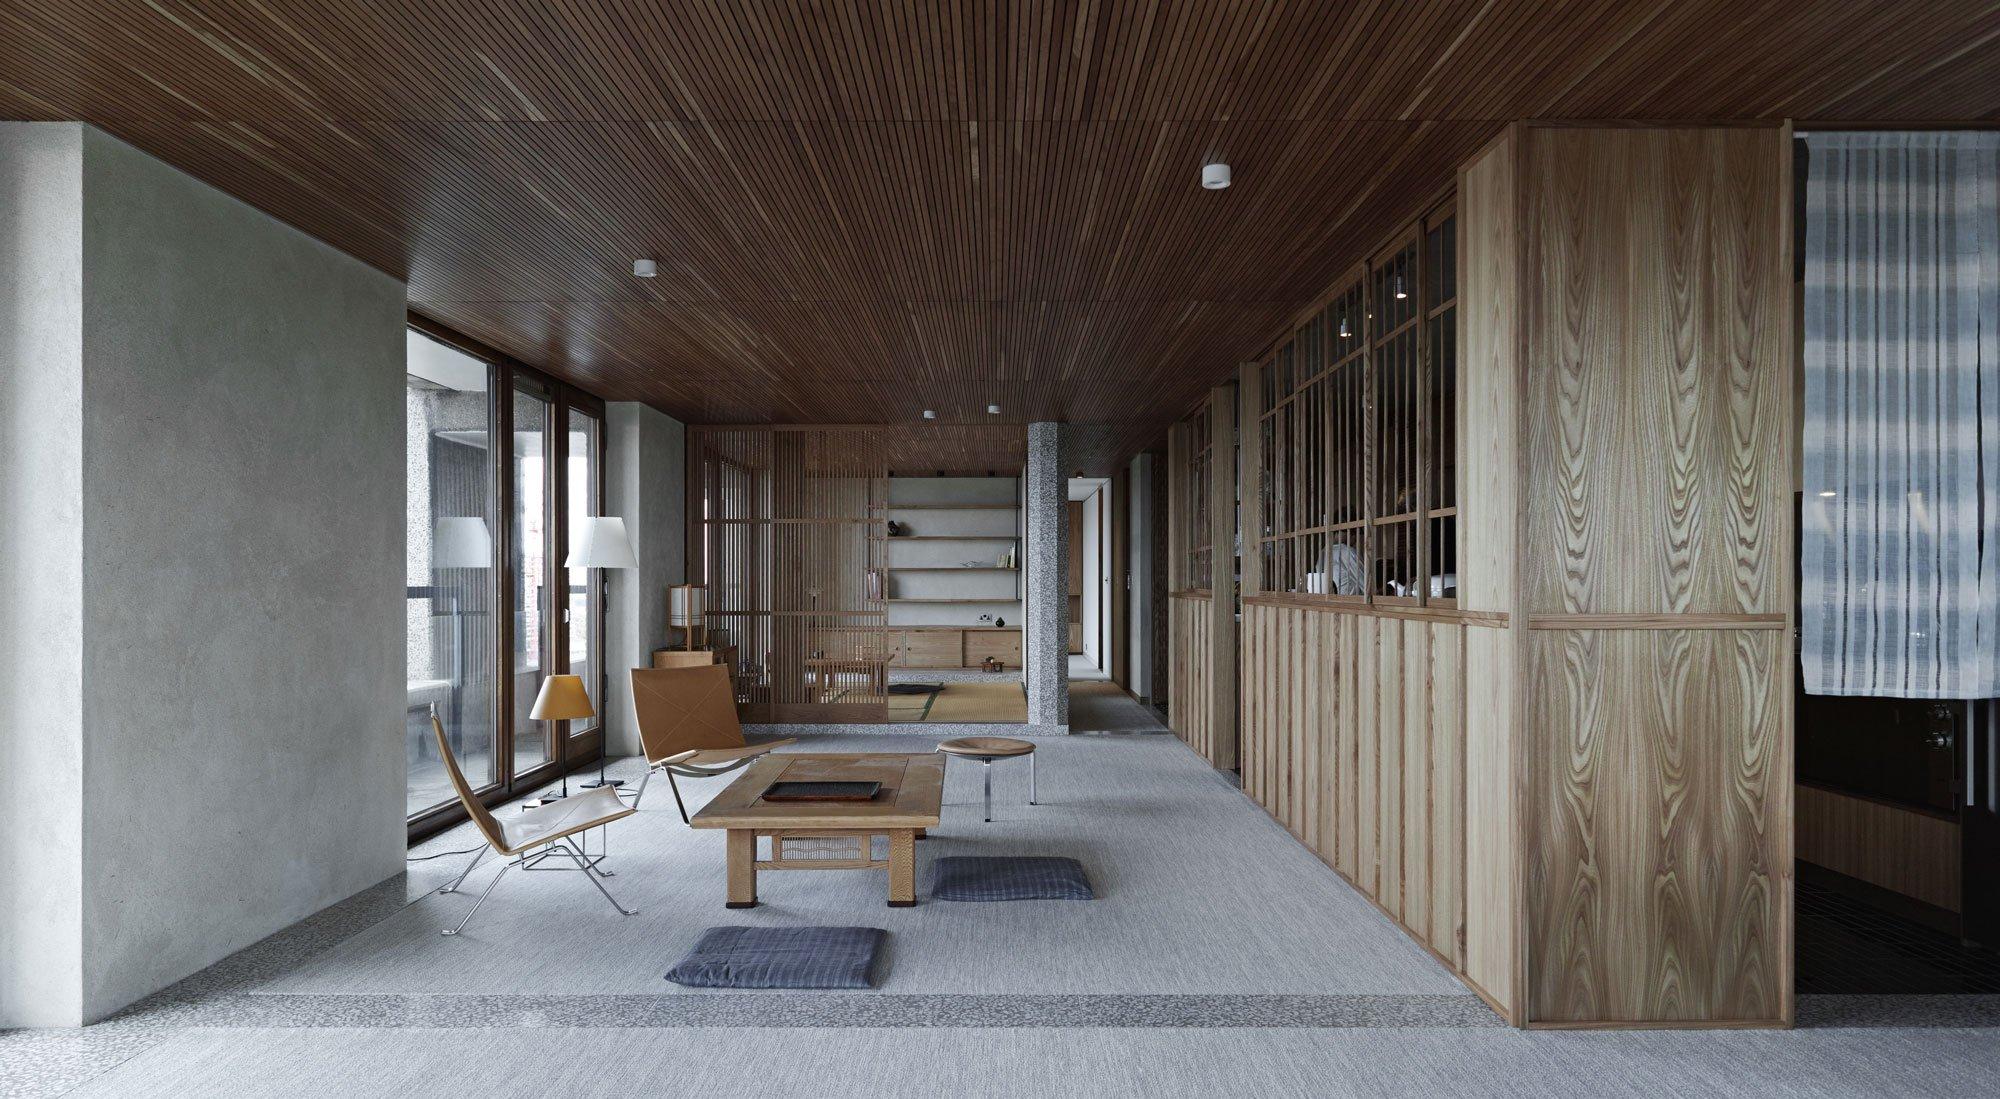 Apartment im Barbican-Komplex von Takero Shimazaki Architects